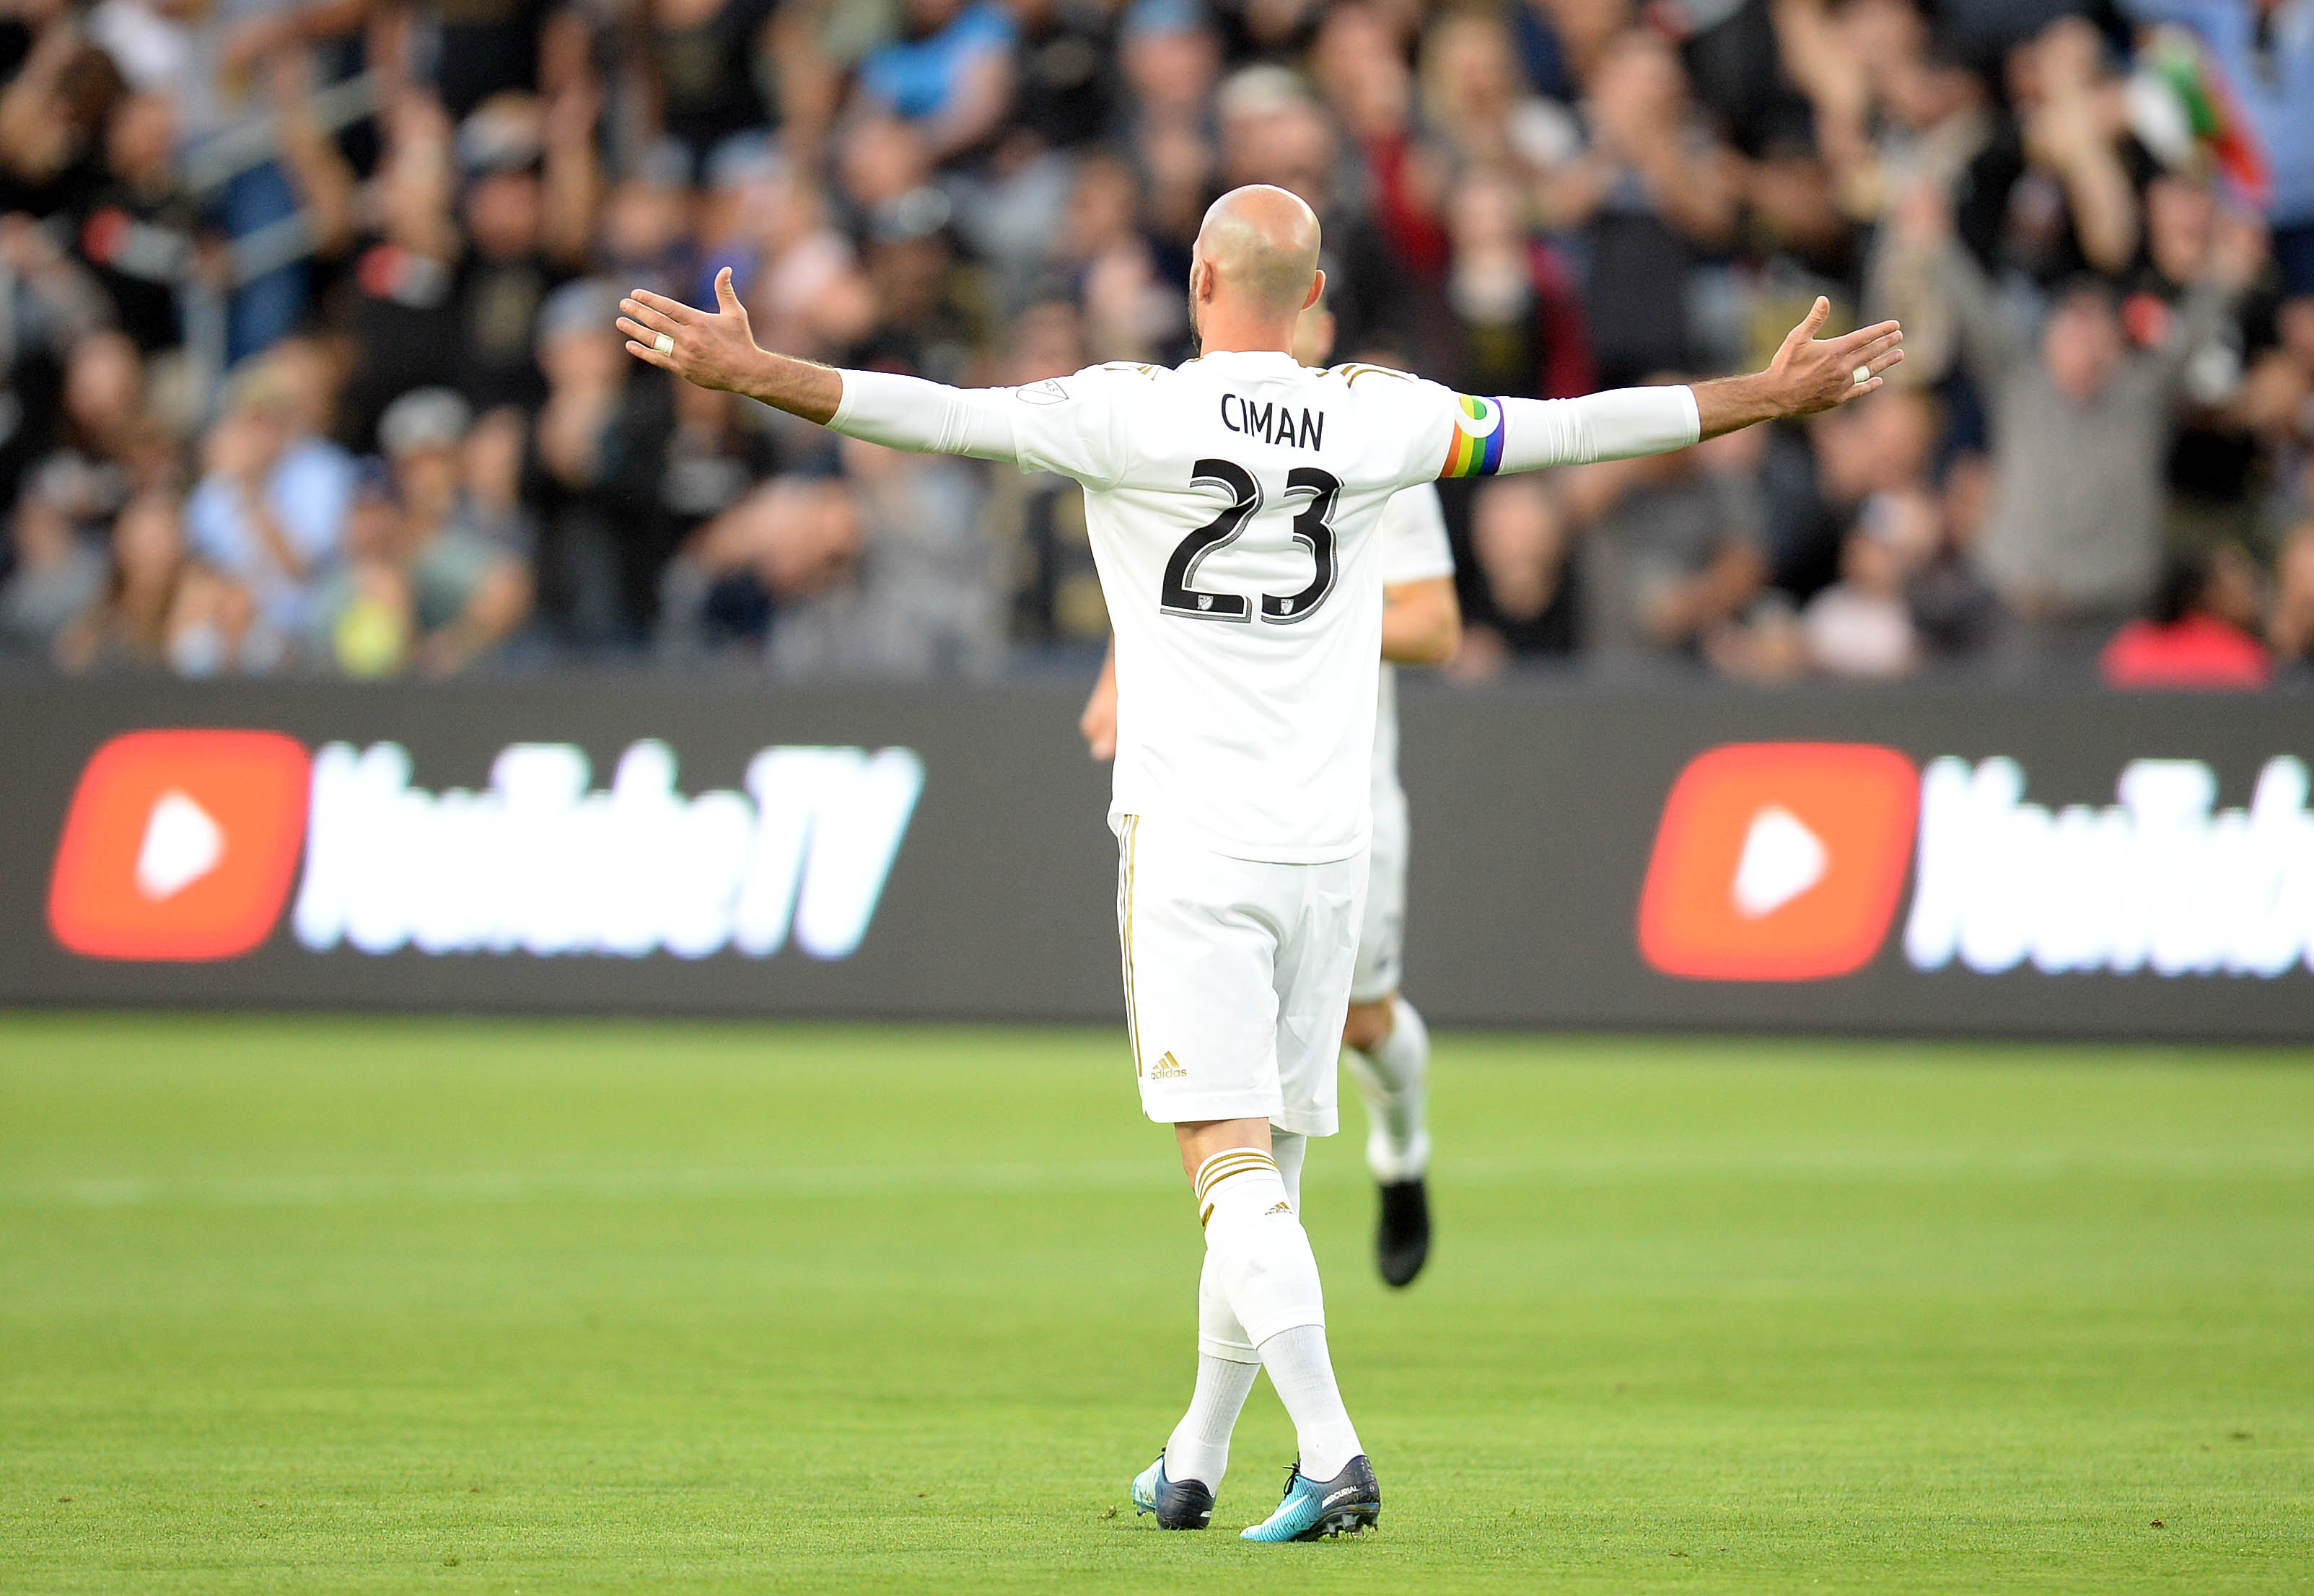 Ciman's return fuels LAFC to 2-0 win over Columbus